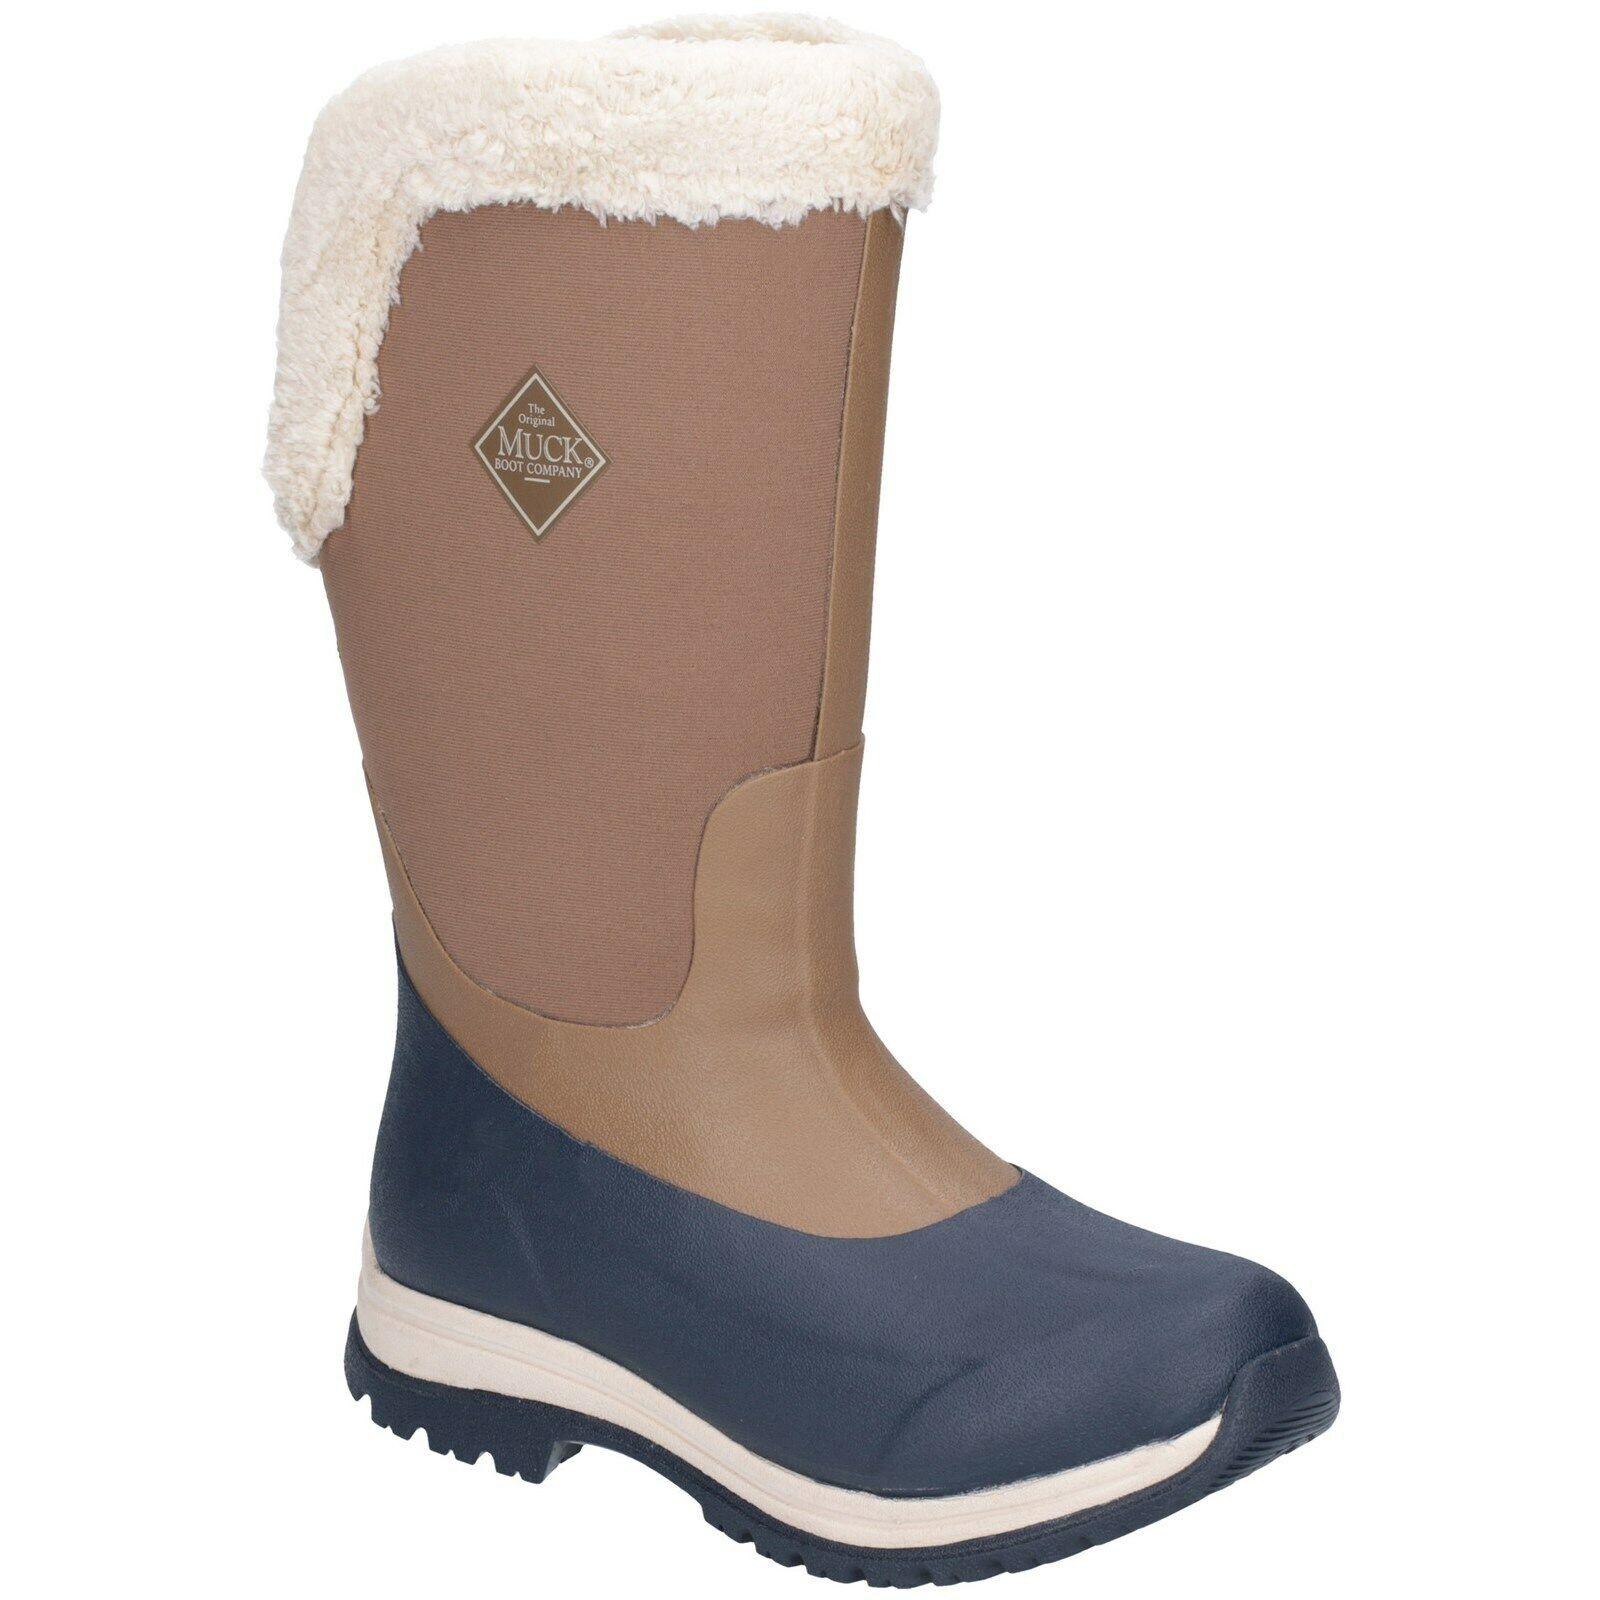 Muck botas Apres para mujer Bota de alto Slip On Impermeable Wellingtons